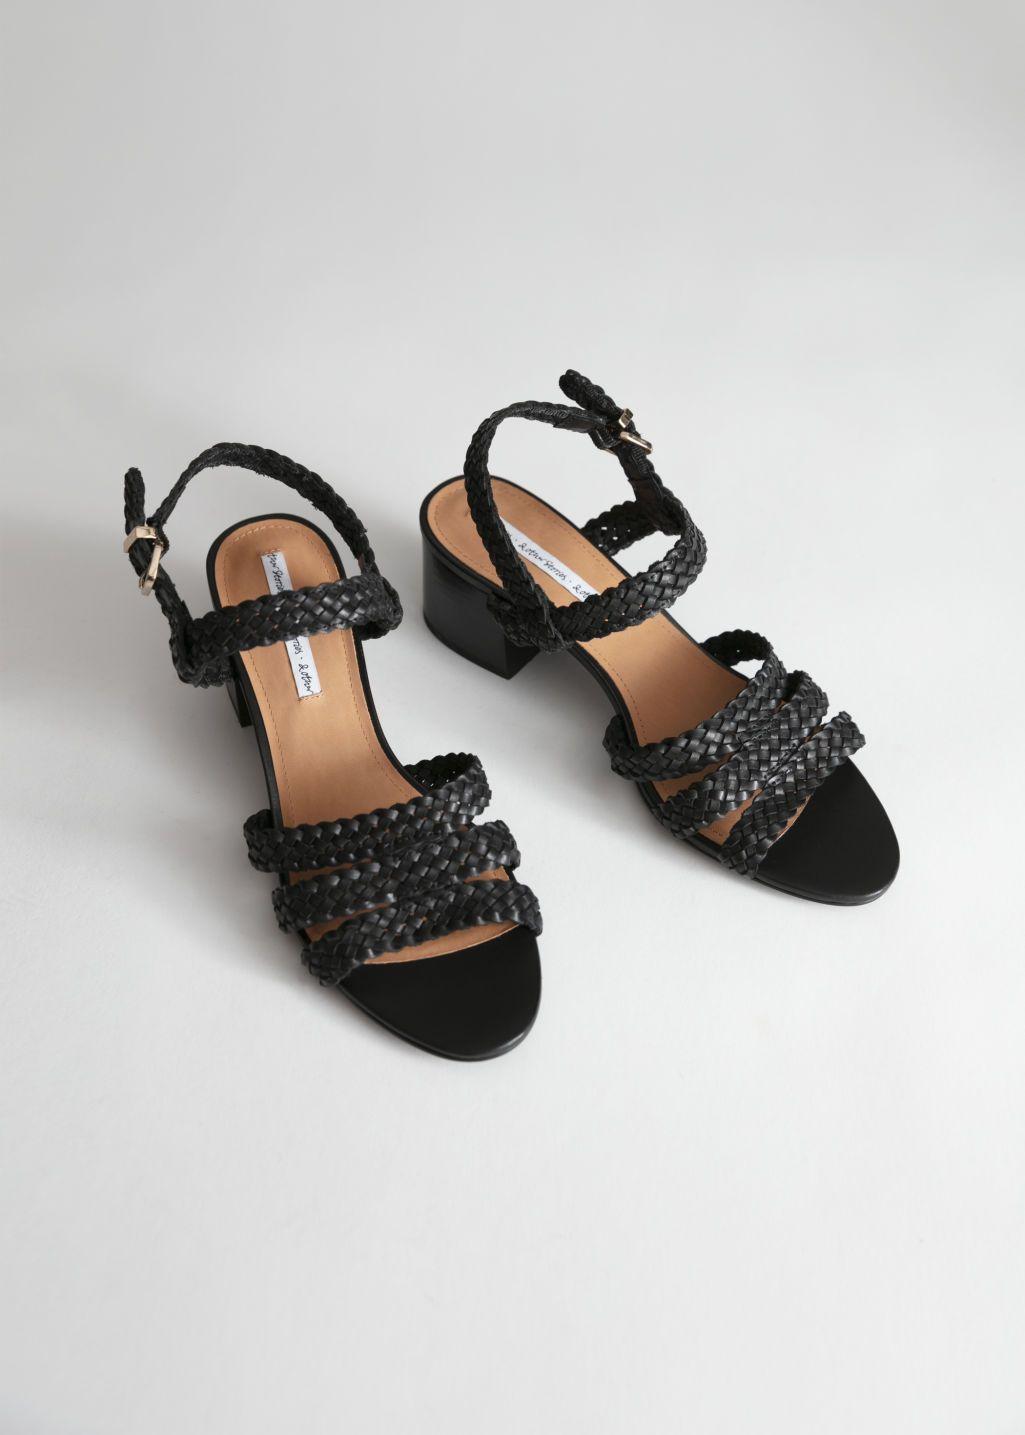 36f47ab1832 Braided Trio Strap Heeled Sandals in 2019 | clothing | Strap heels ...